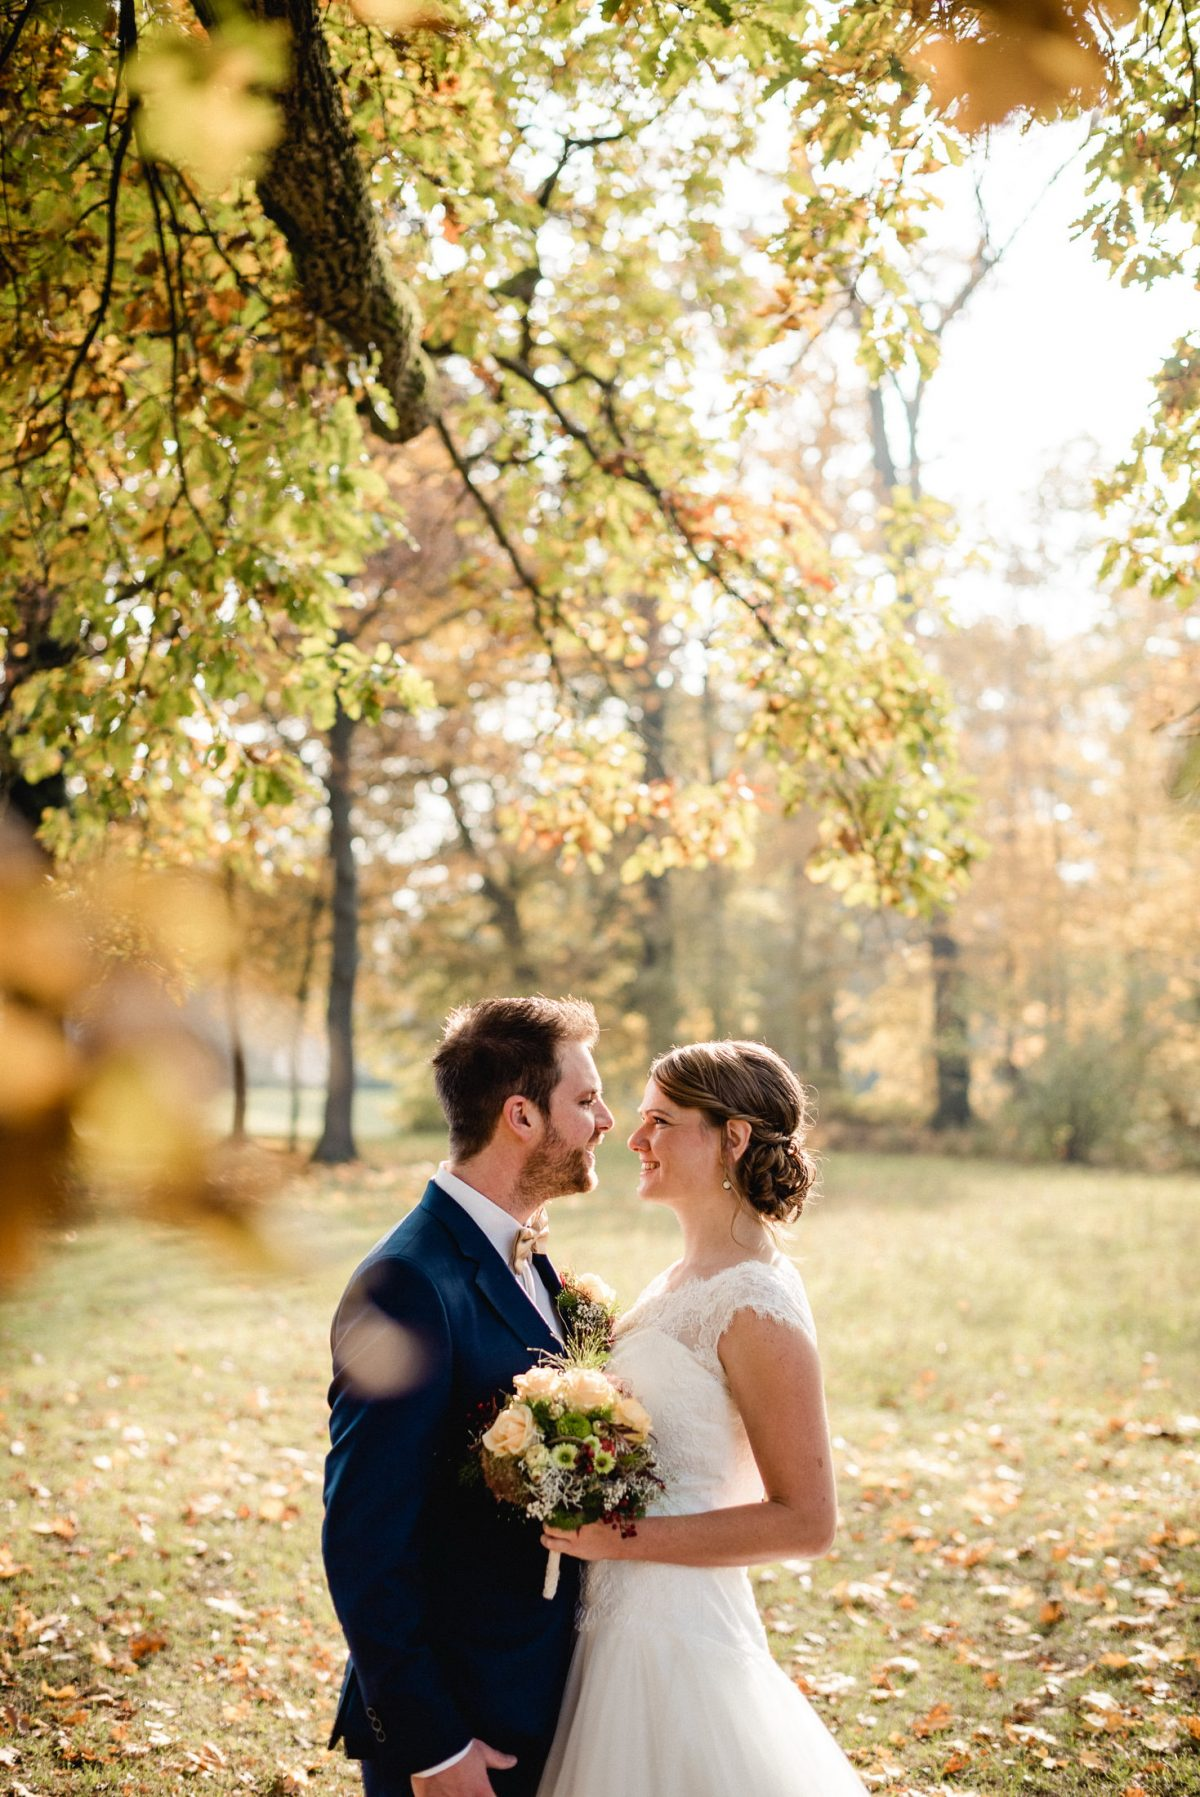 Herbst Bäume Blätter Äste Sonne Paar Blumenstrauß Liebe Augenblick Anzug